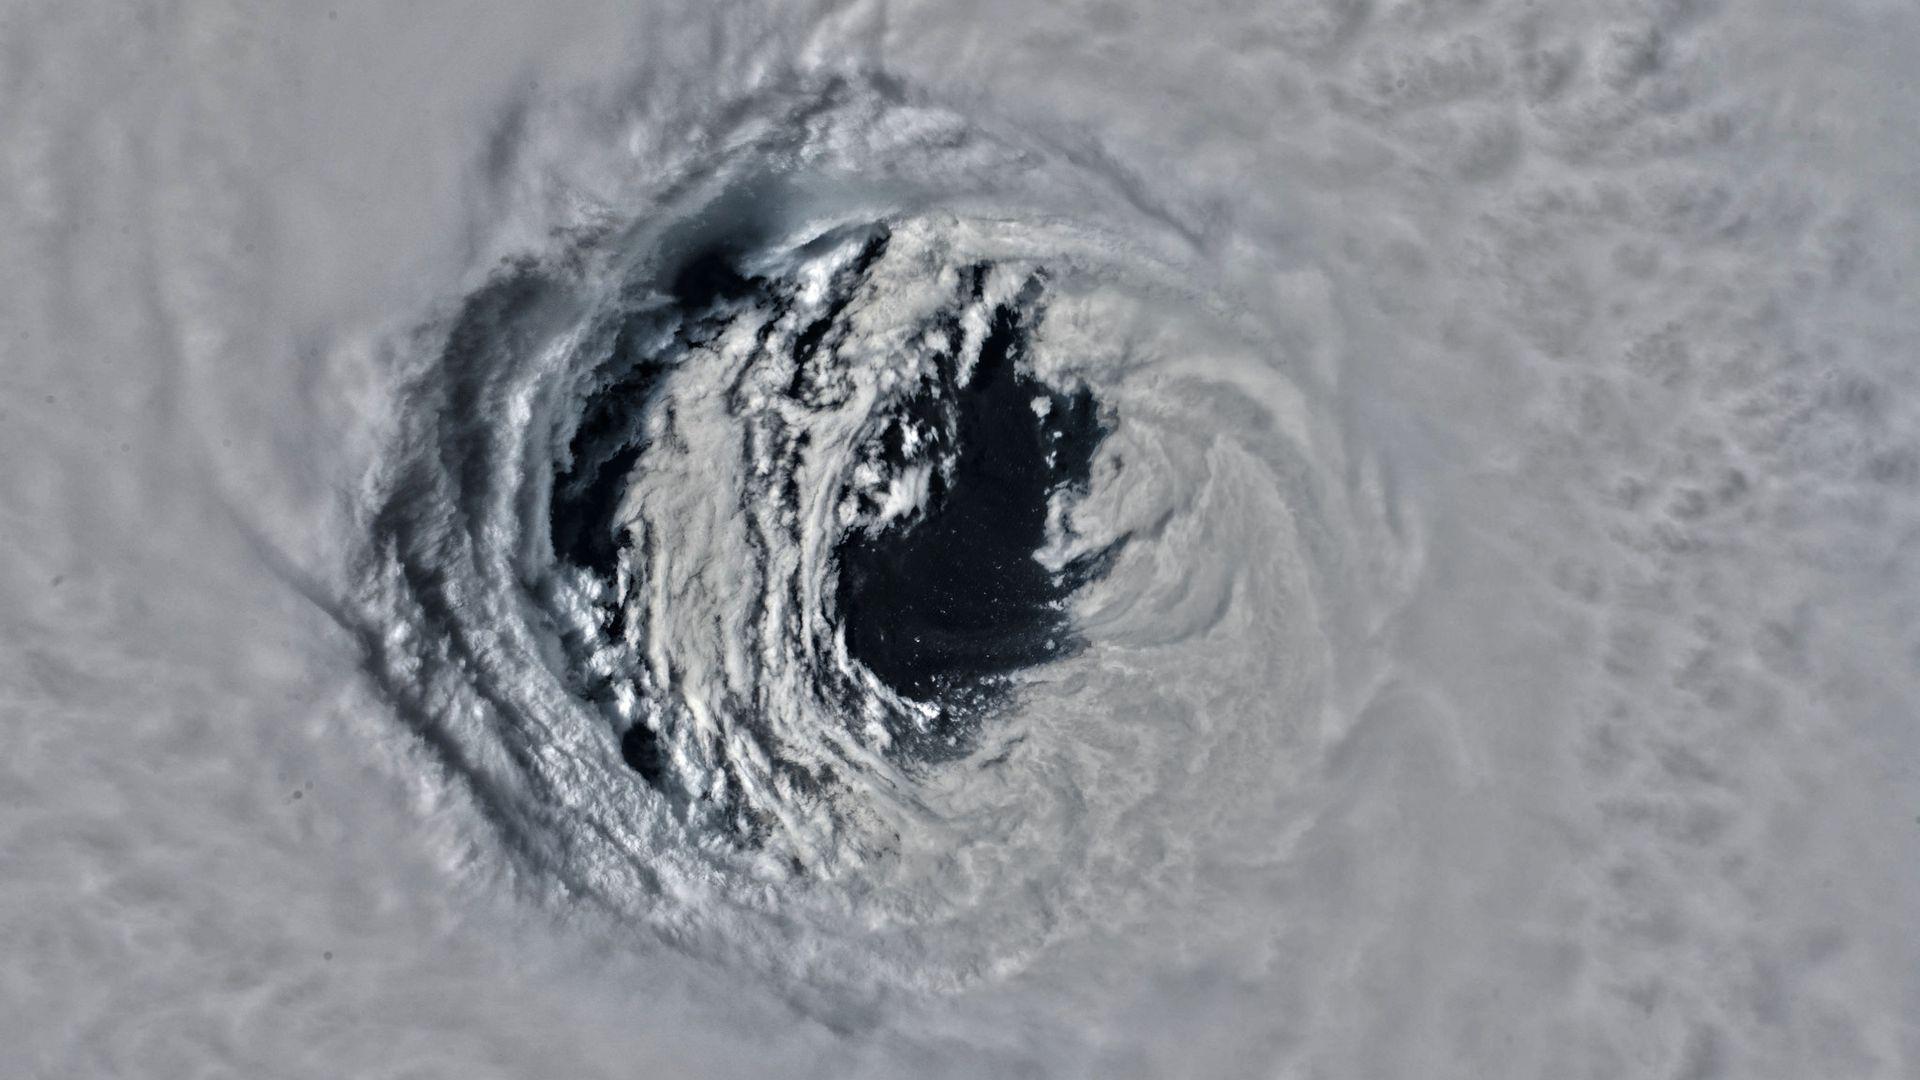 Eye of hurricane michael